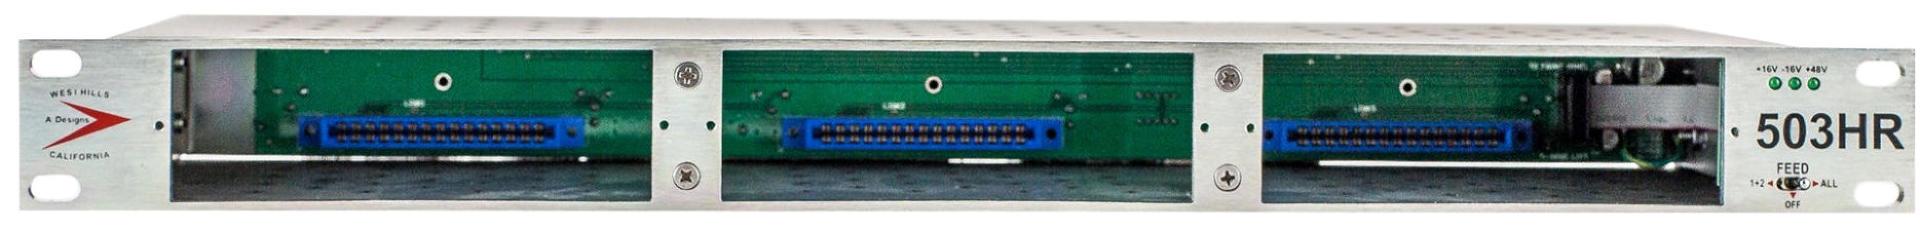 A Designs 503HR 1U 3 slot rack